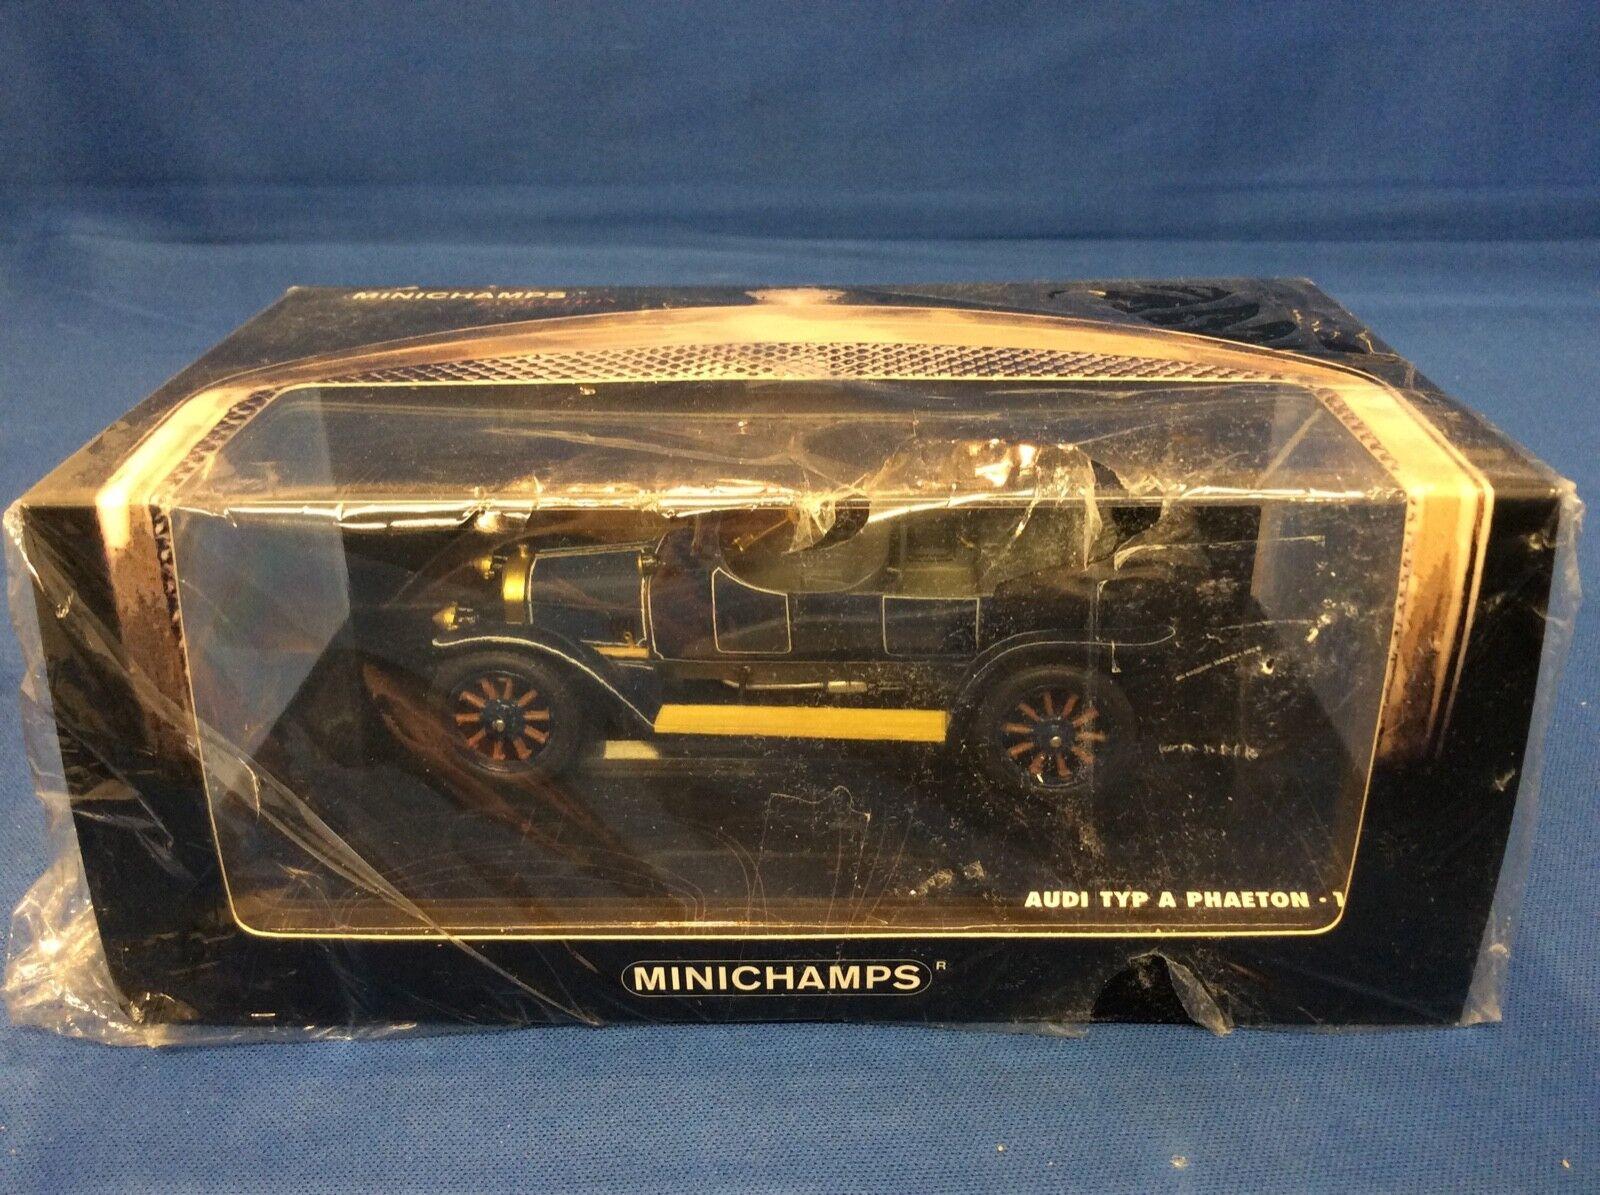 Minichamps 1910 Audi Type A Phaeton 1 43 Scale 437 019031